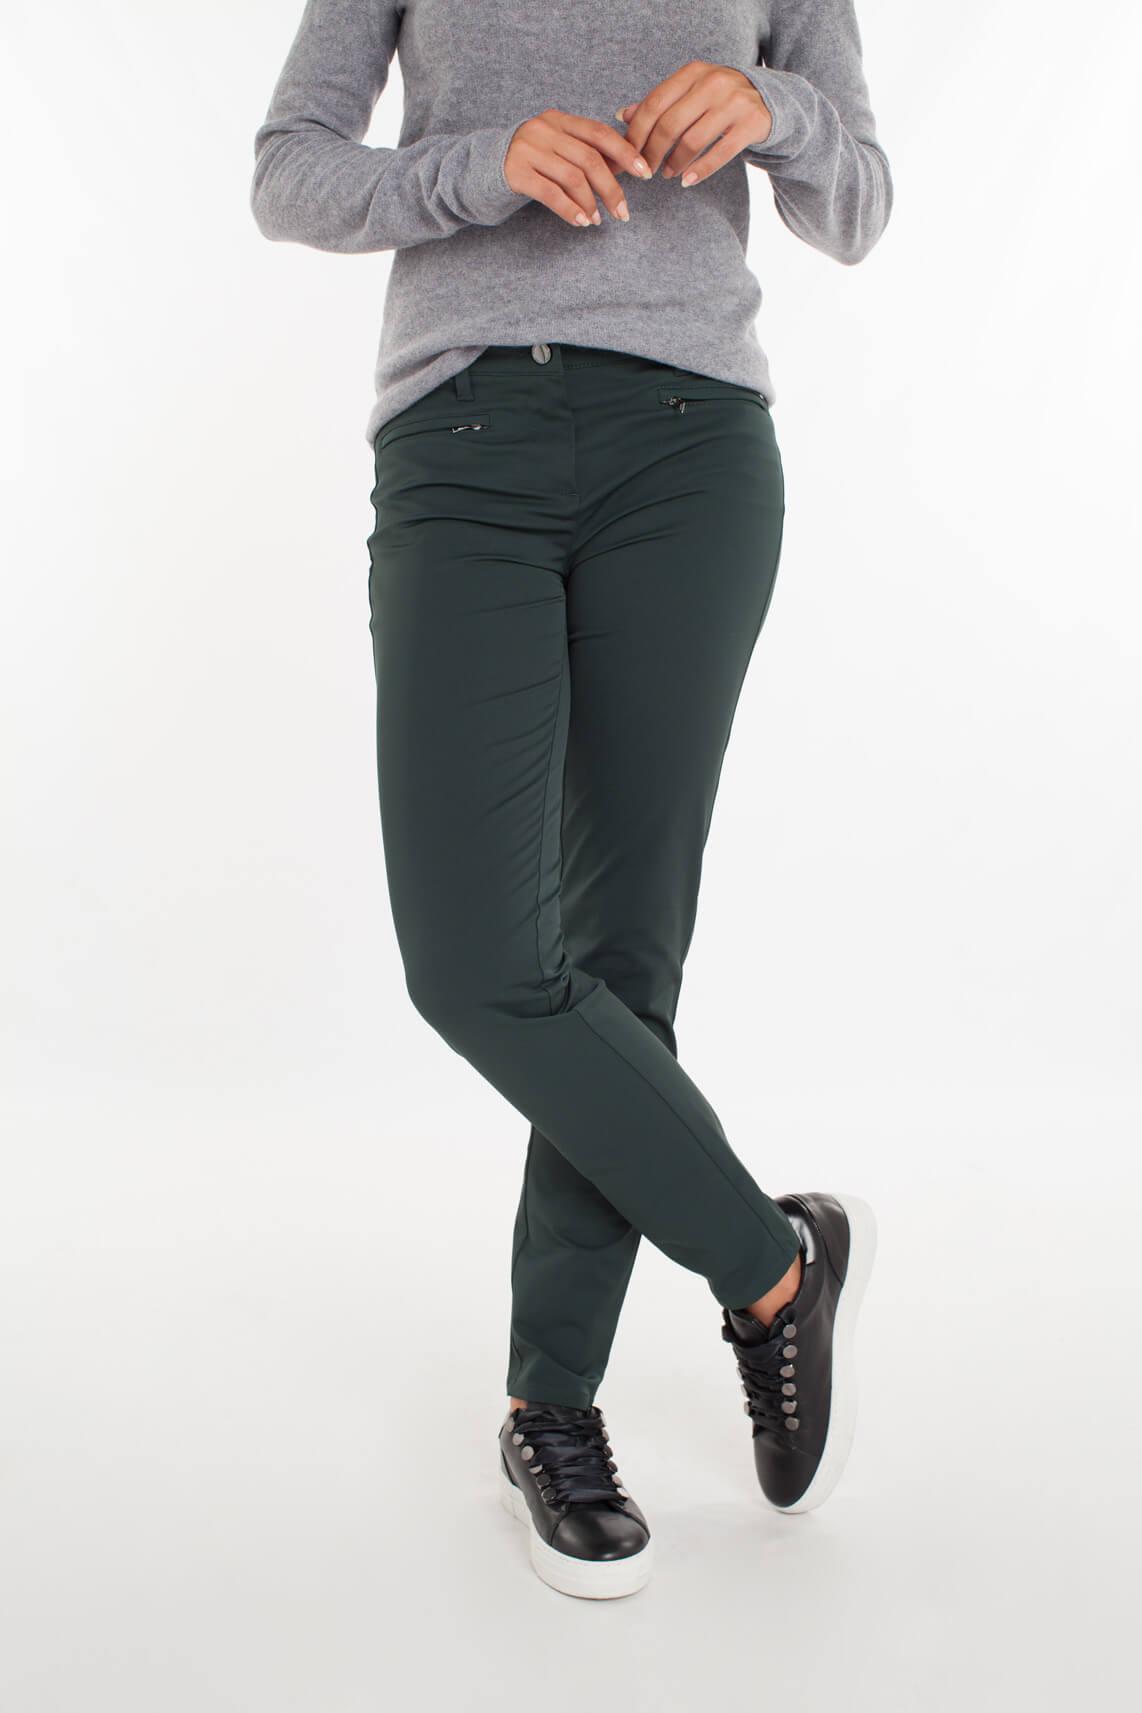 Rosner Dames Alisa pantalon groen